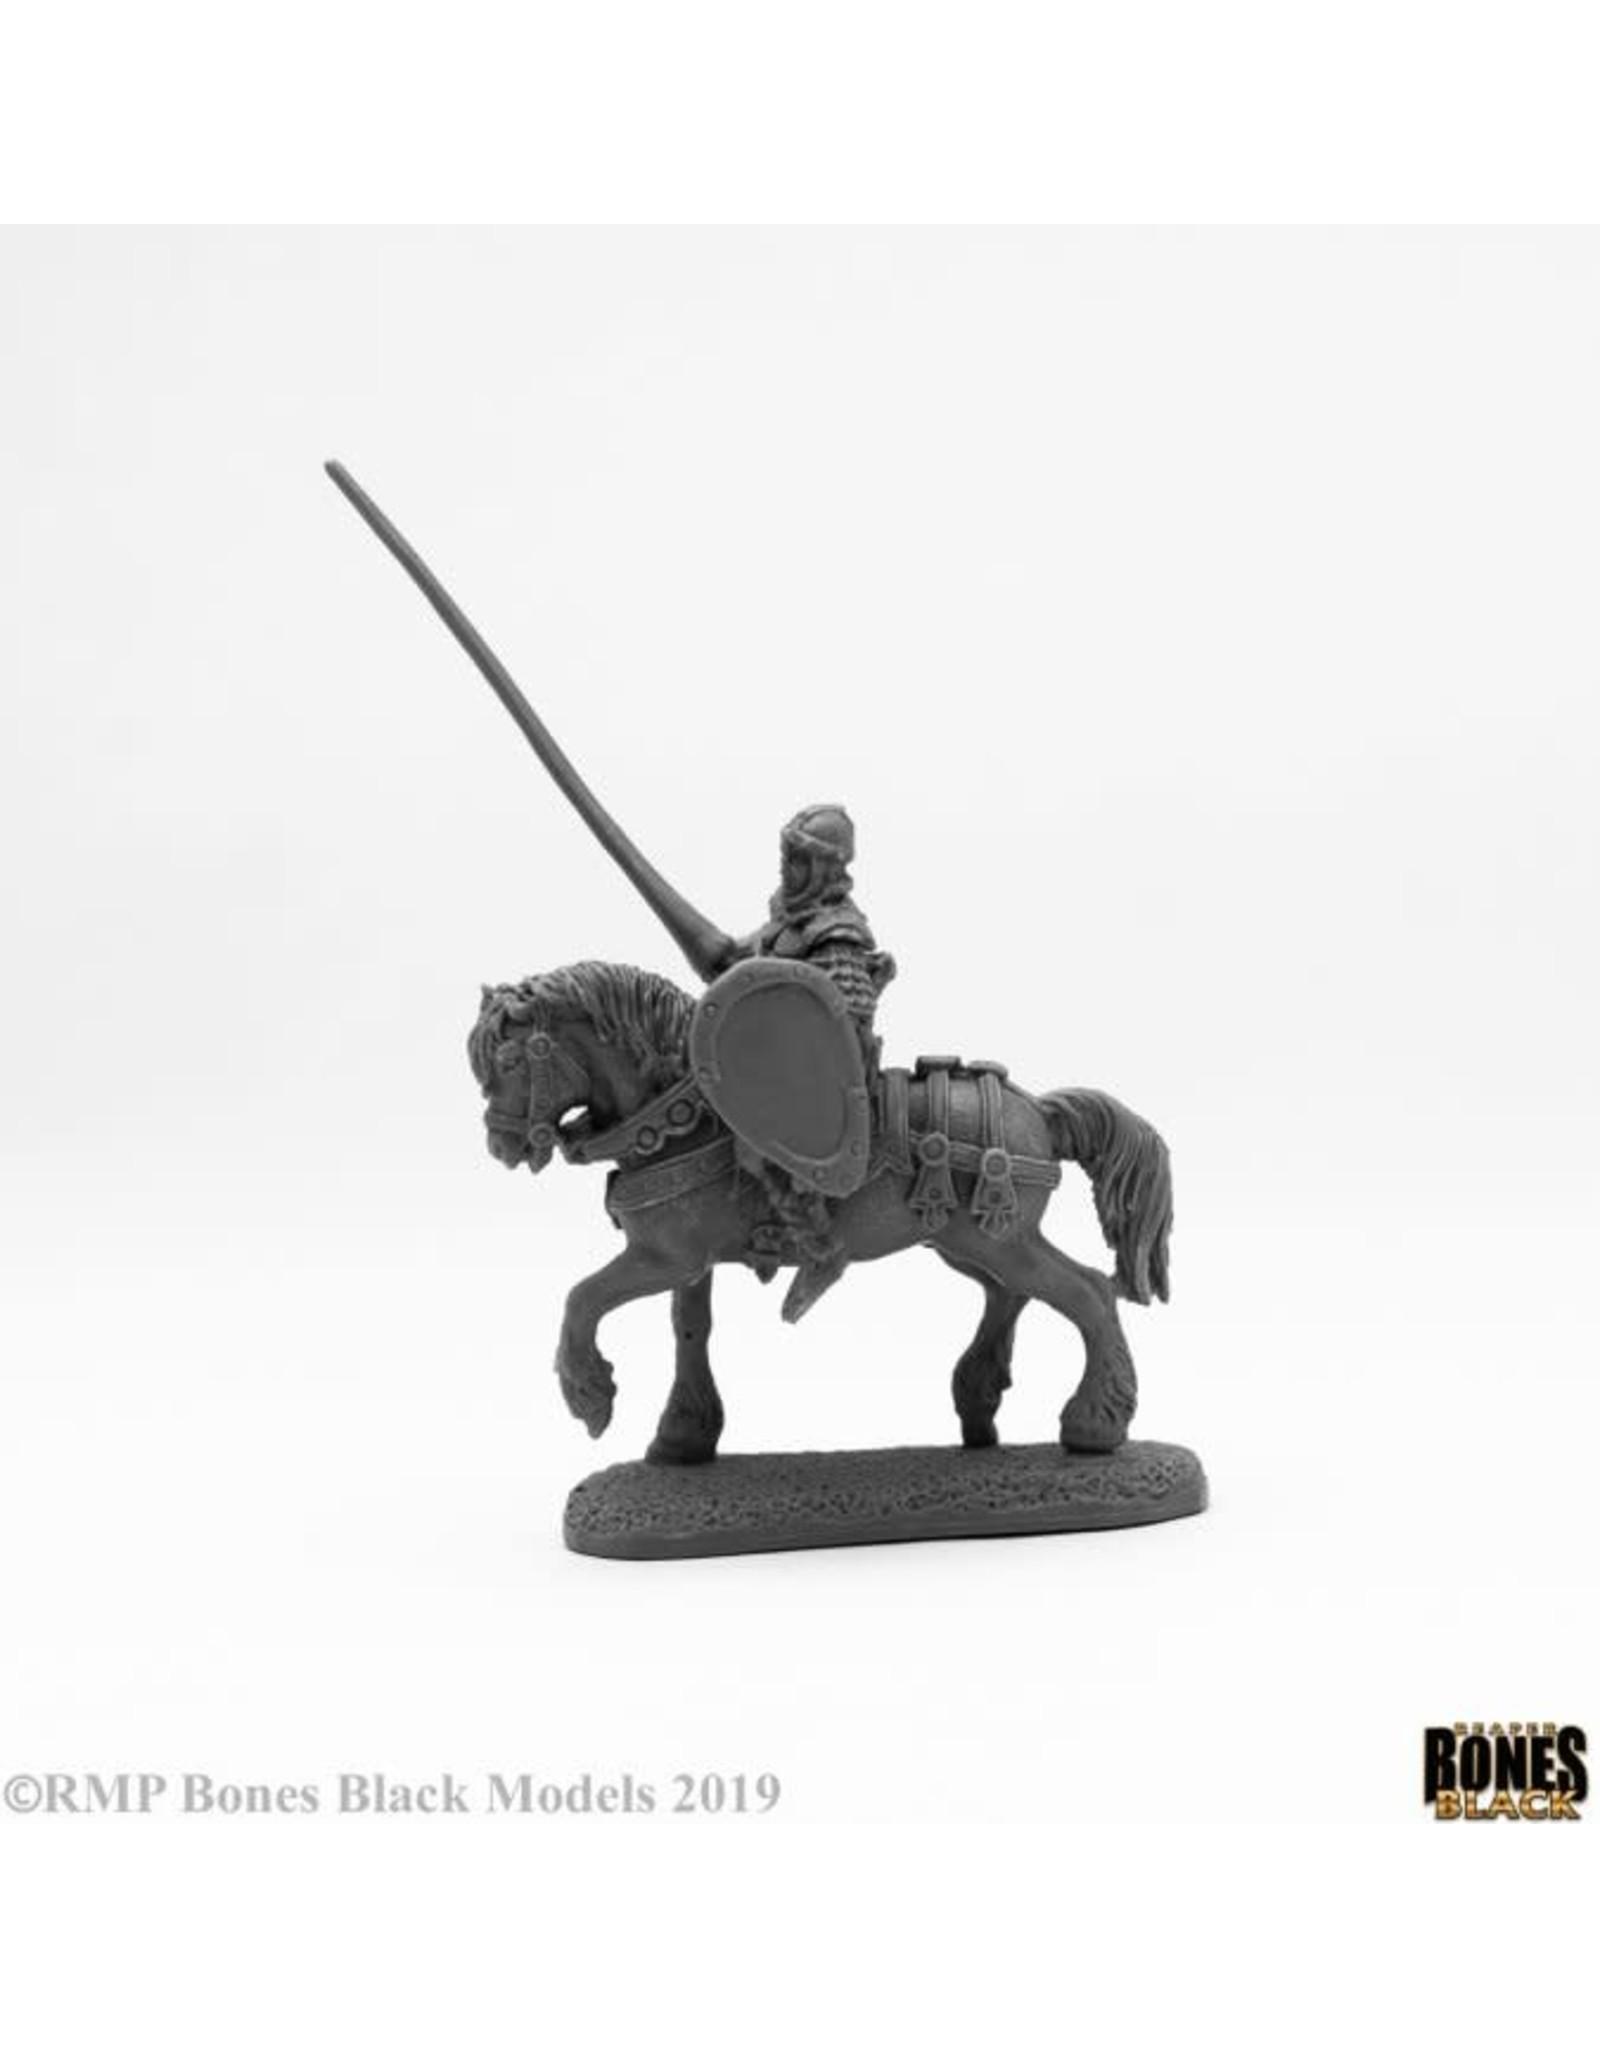 Reaper Reaper: Bones Black: Anhurian Cavalry